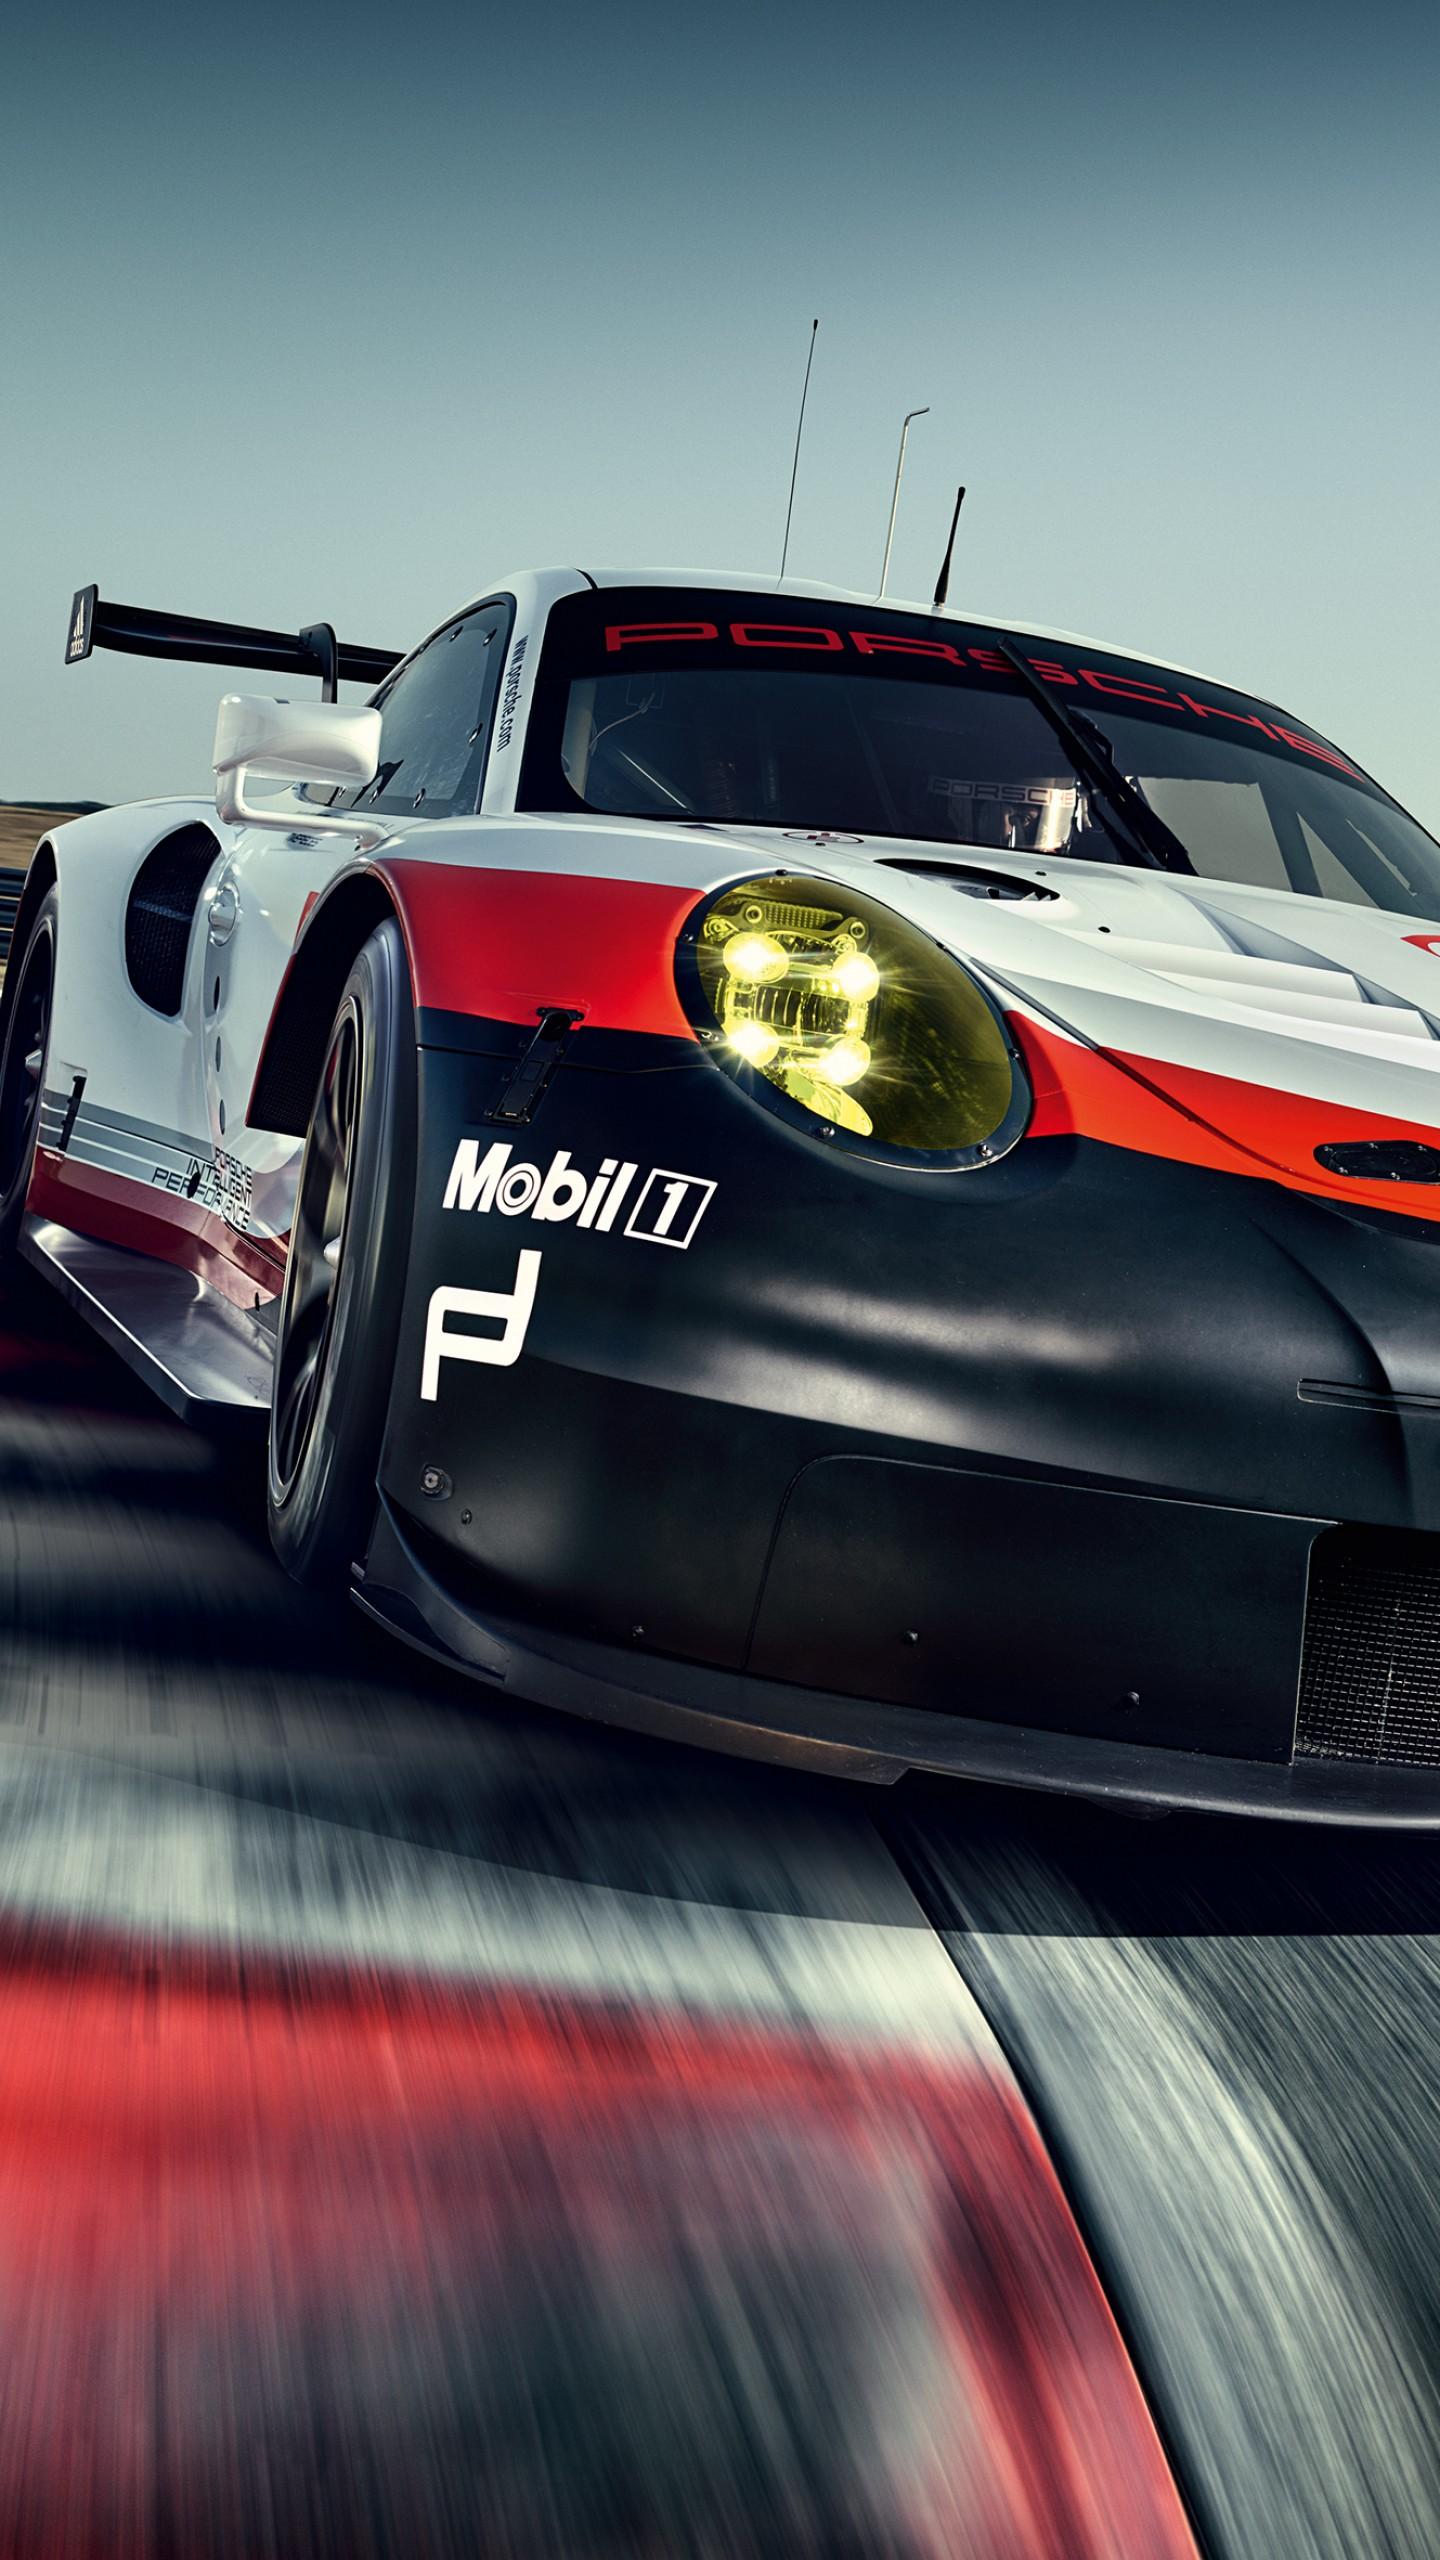 Lexus Electric Car >> Wallpaper Porsche 911 RSR, sport car, racing, Cars & Bikes #12659